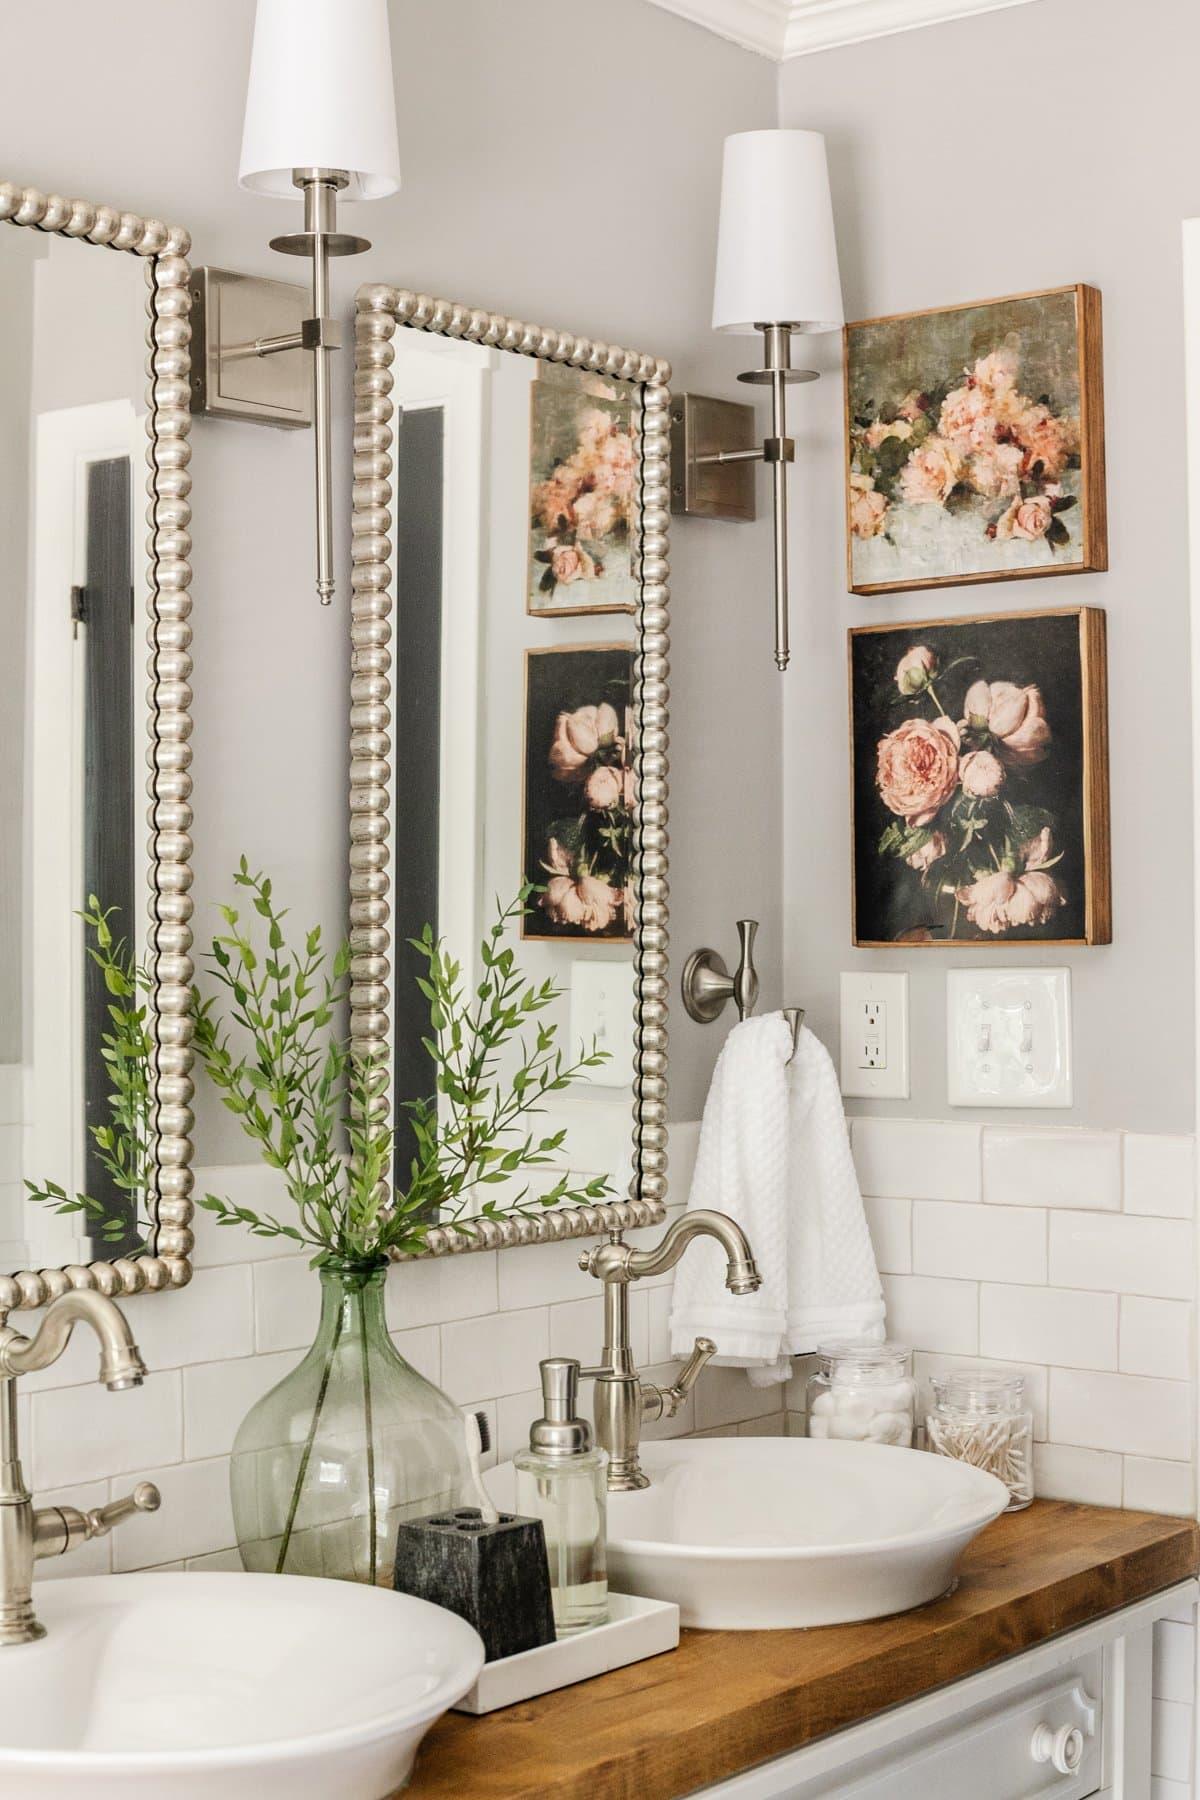 DIY canvas frame vintage art in a bathroom